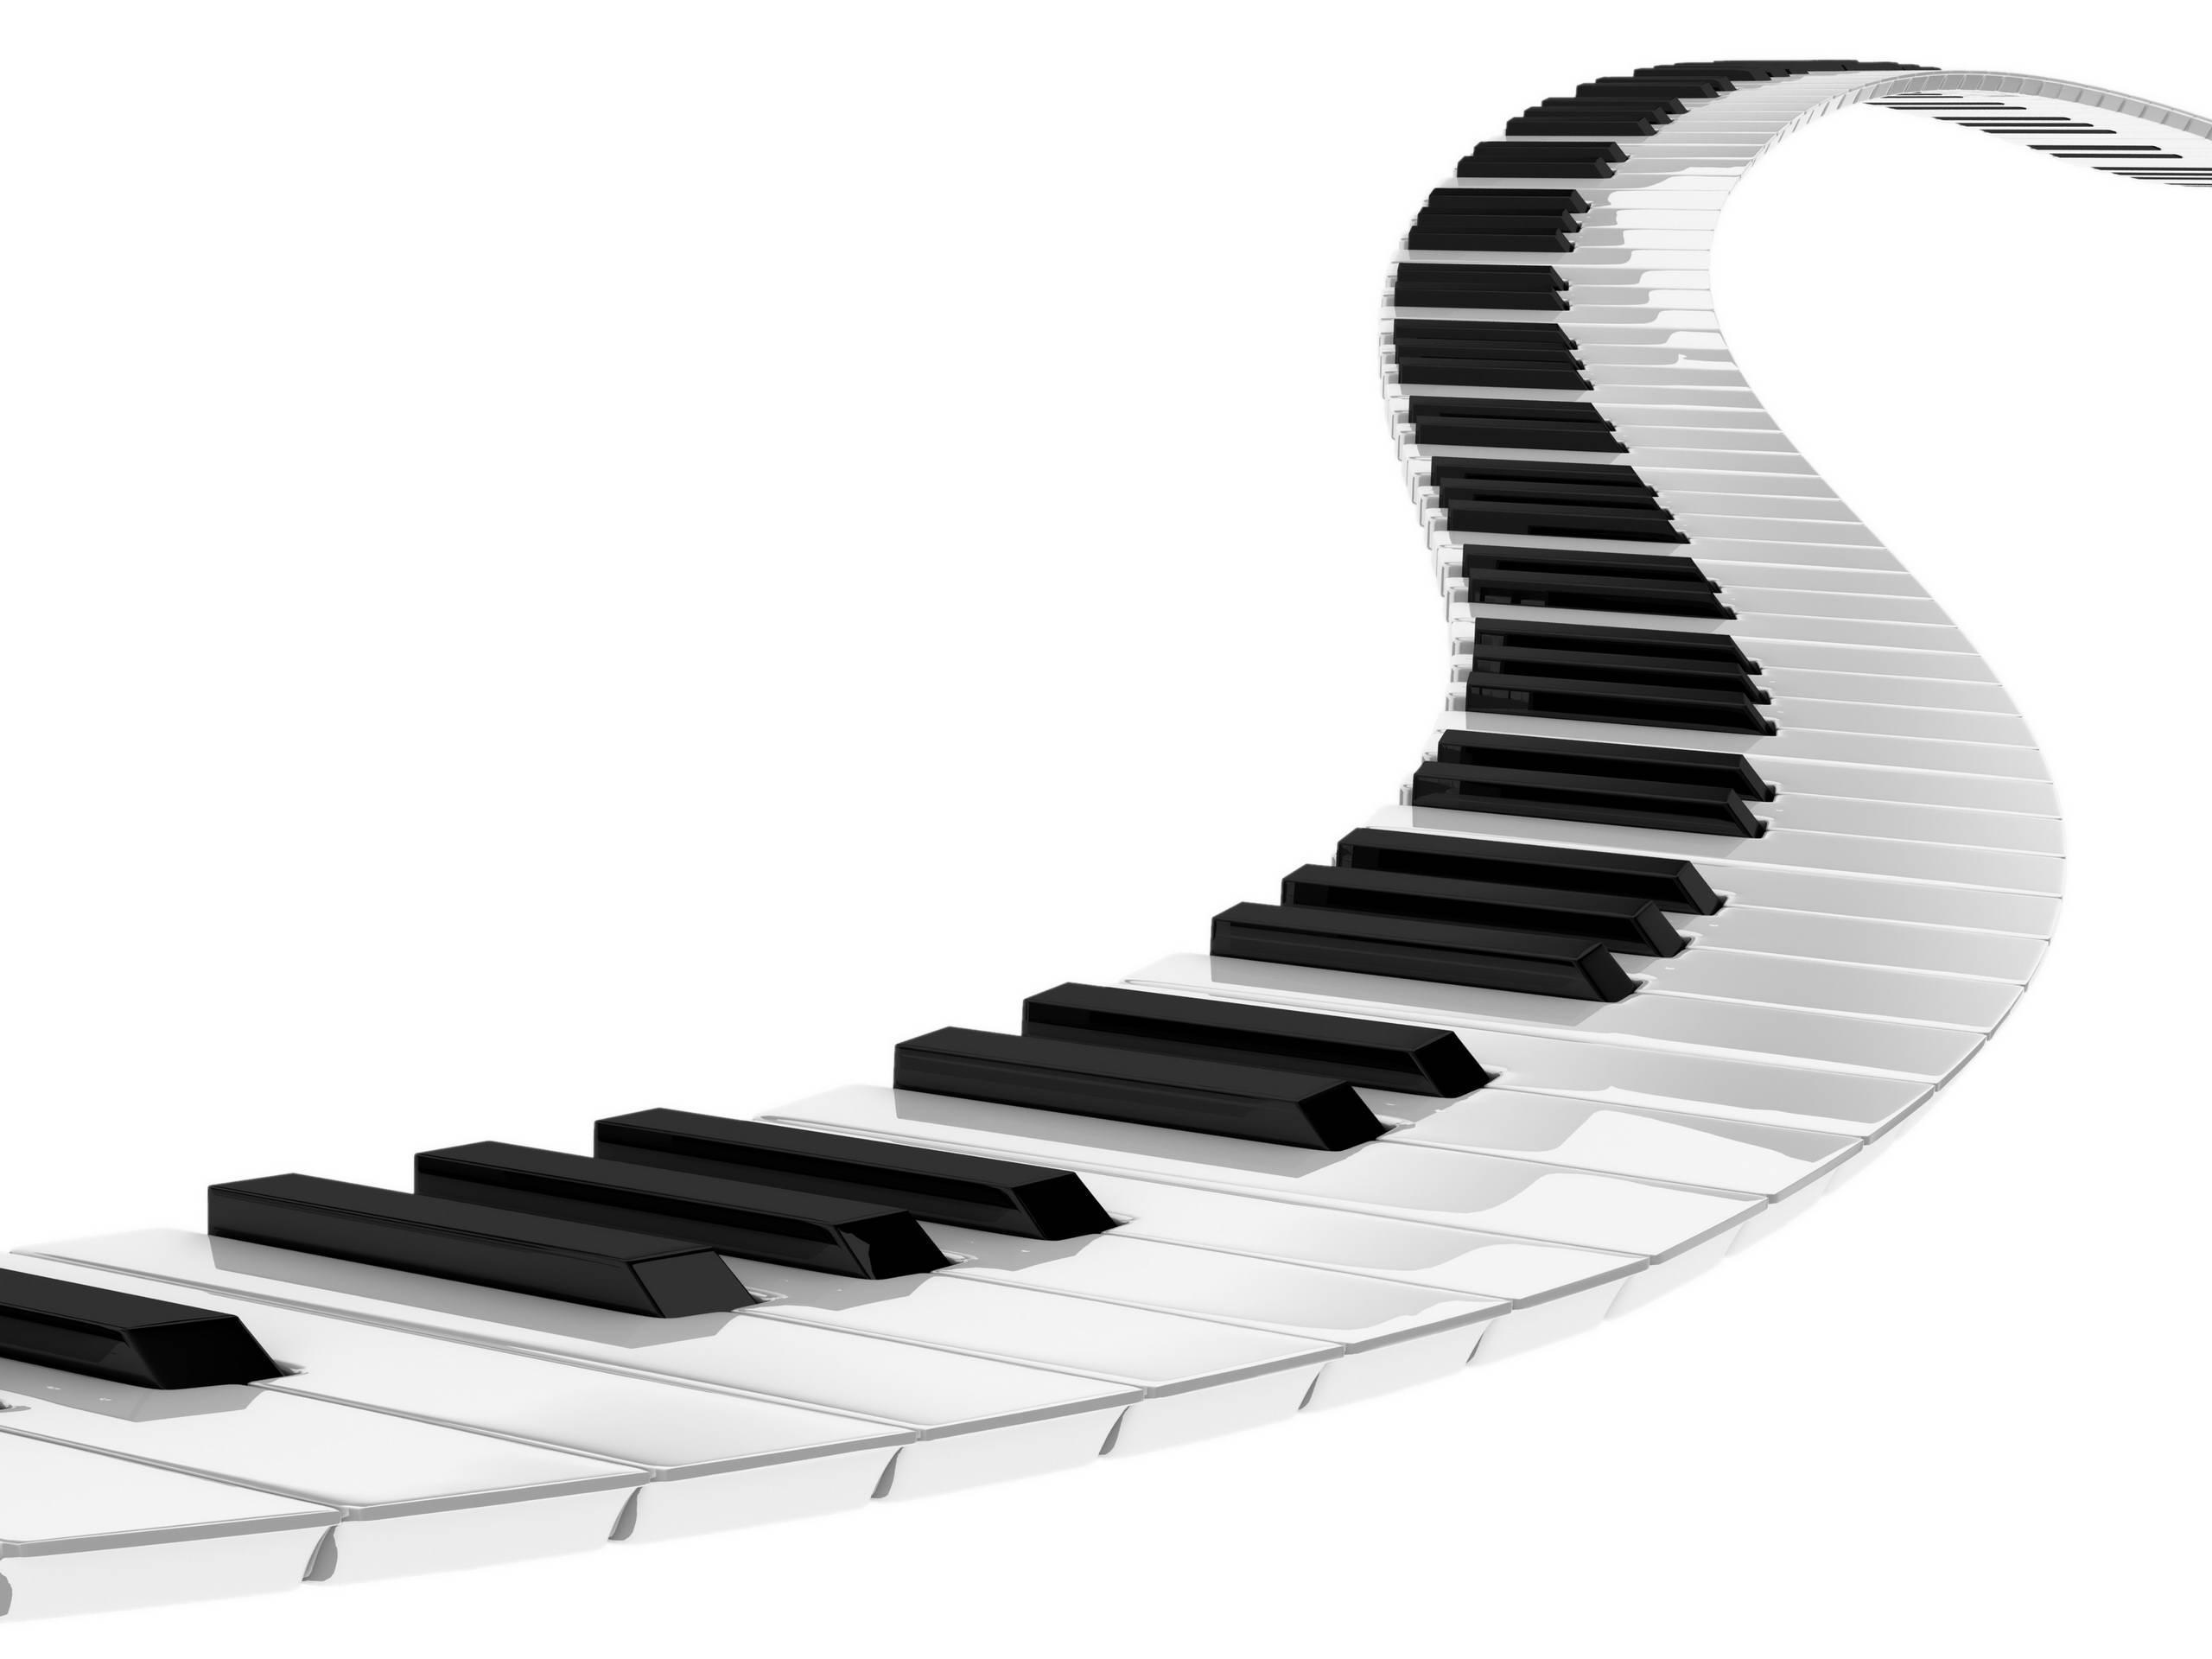 instruments keyboard wallpaper - photo #4